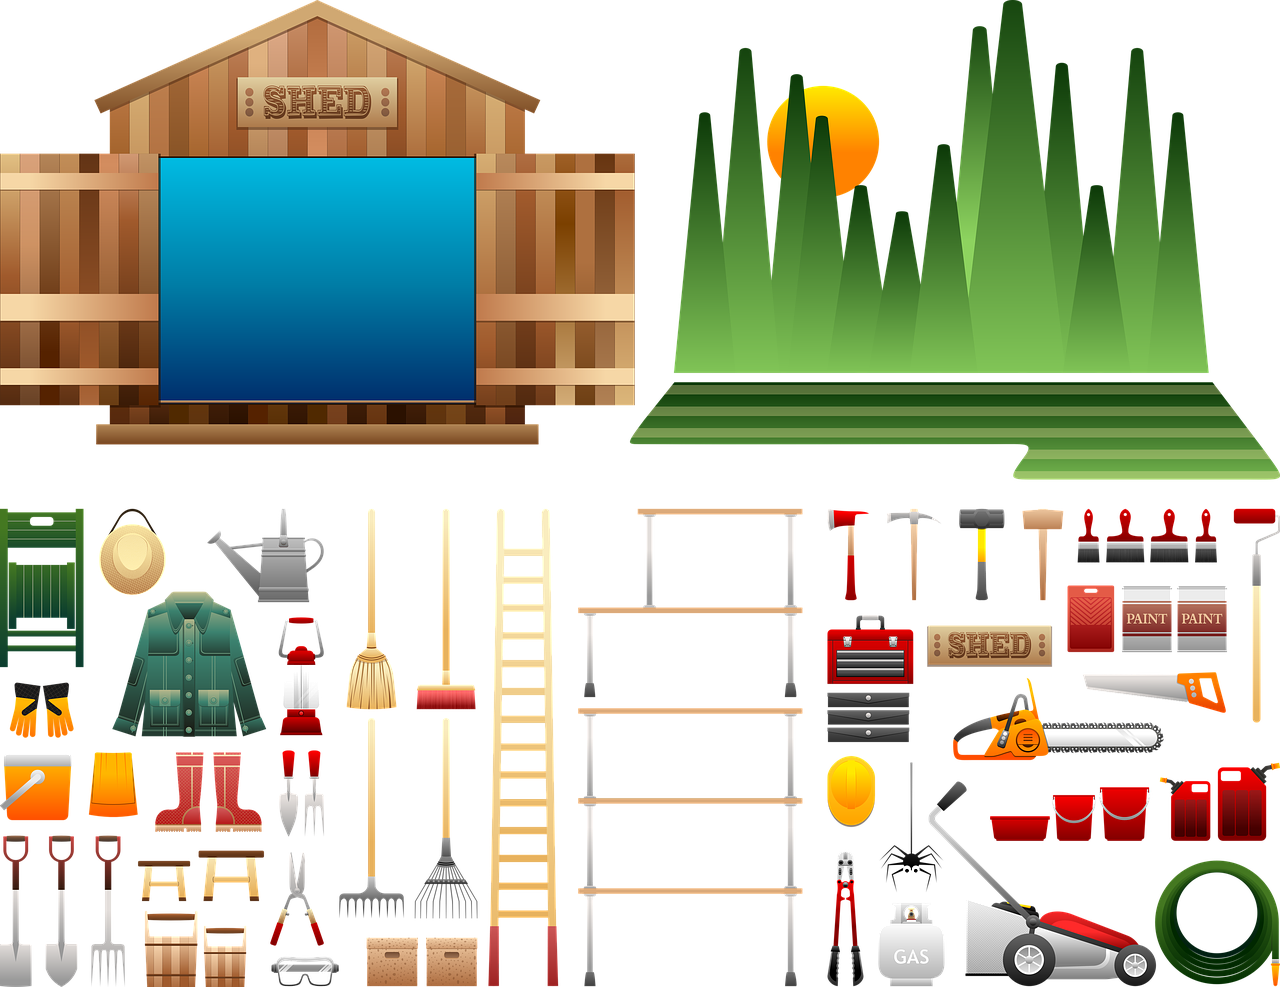 ציוד למחסן ומחסן